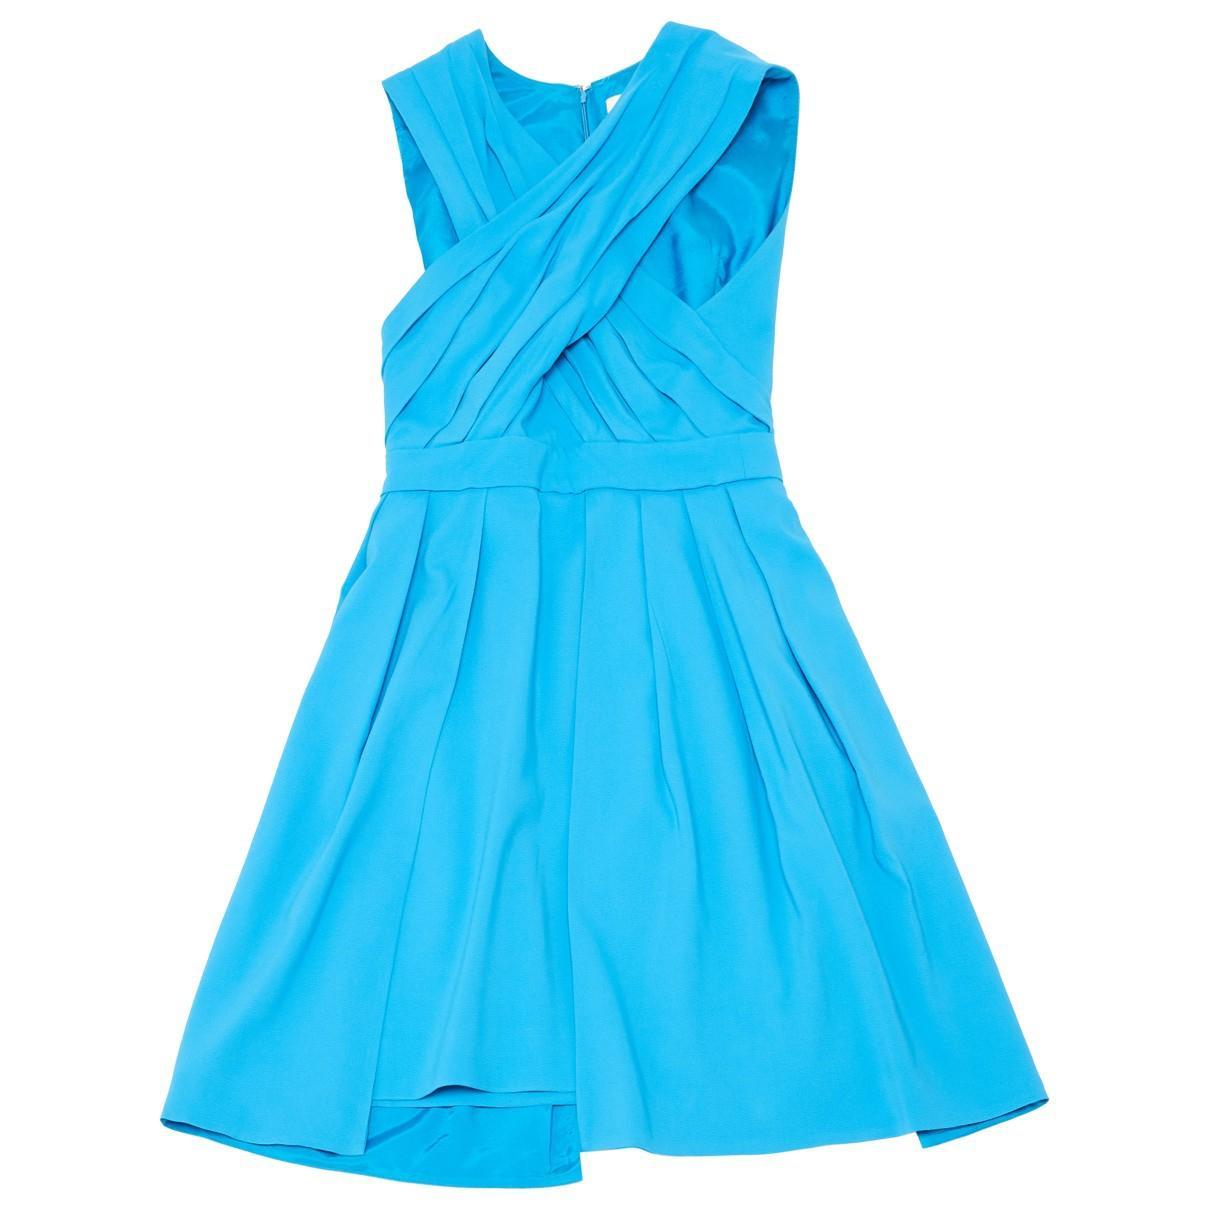 Robe N en Viscose Bleu Synthétique Matthew Williamson en coloris Bleu